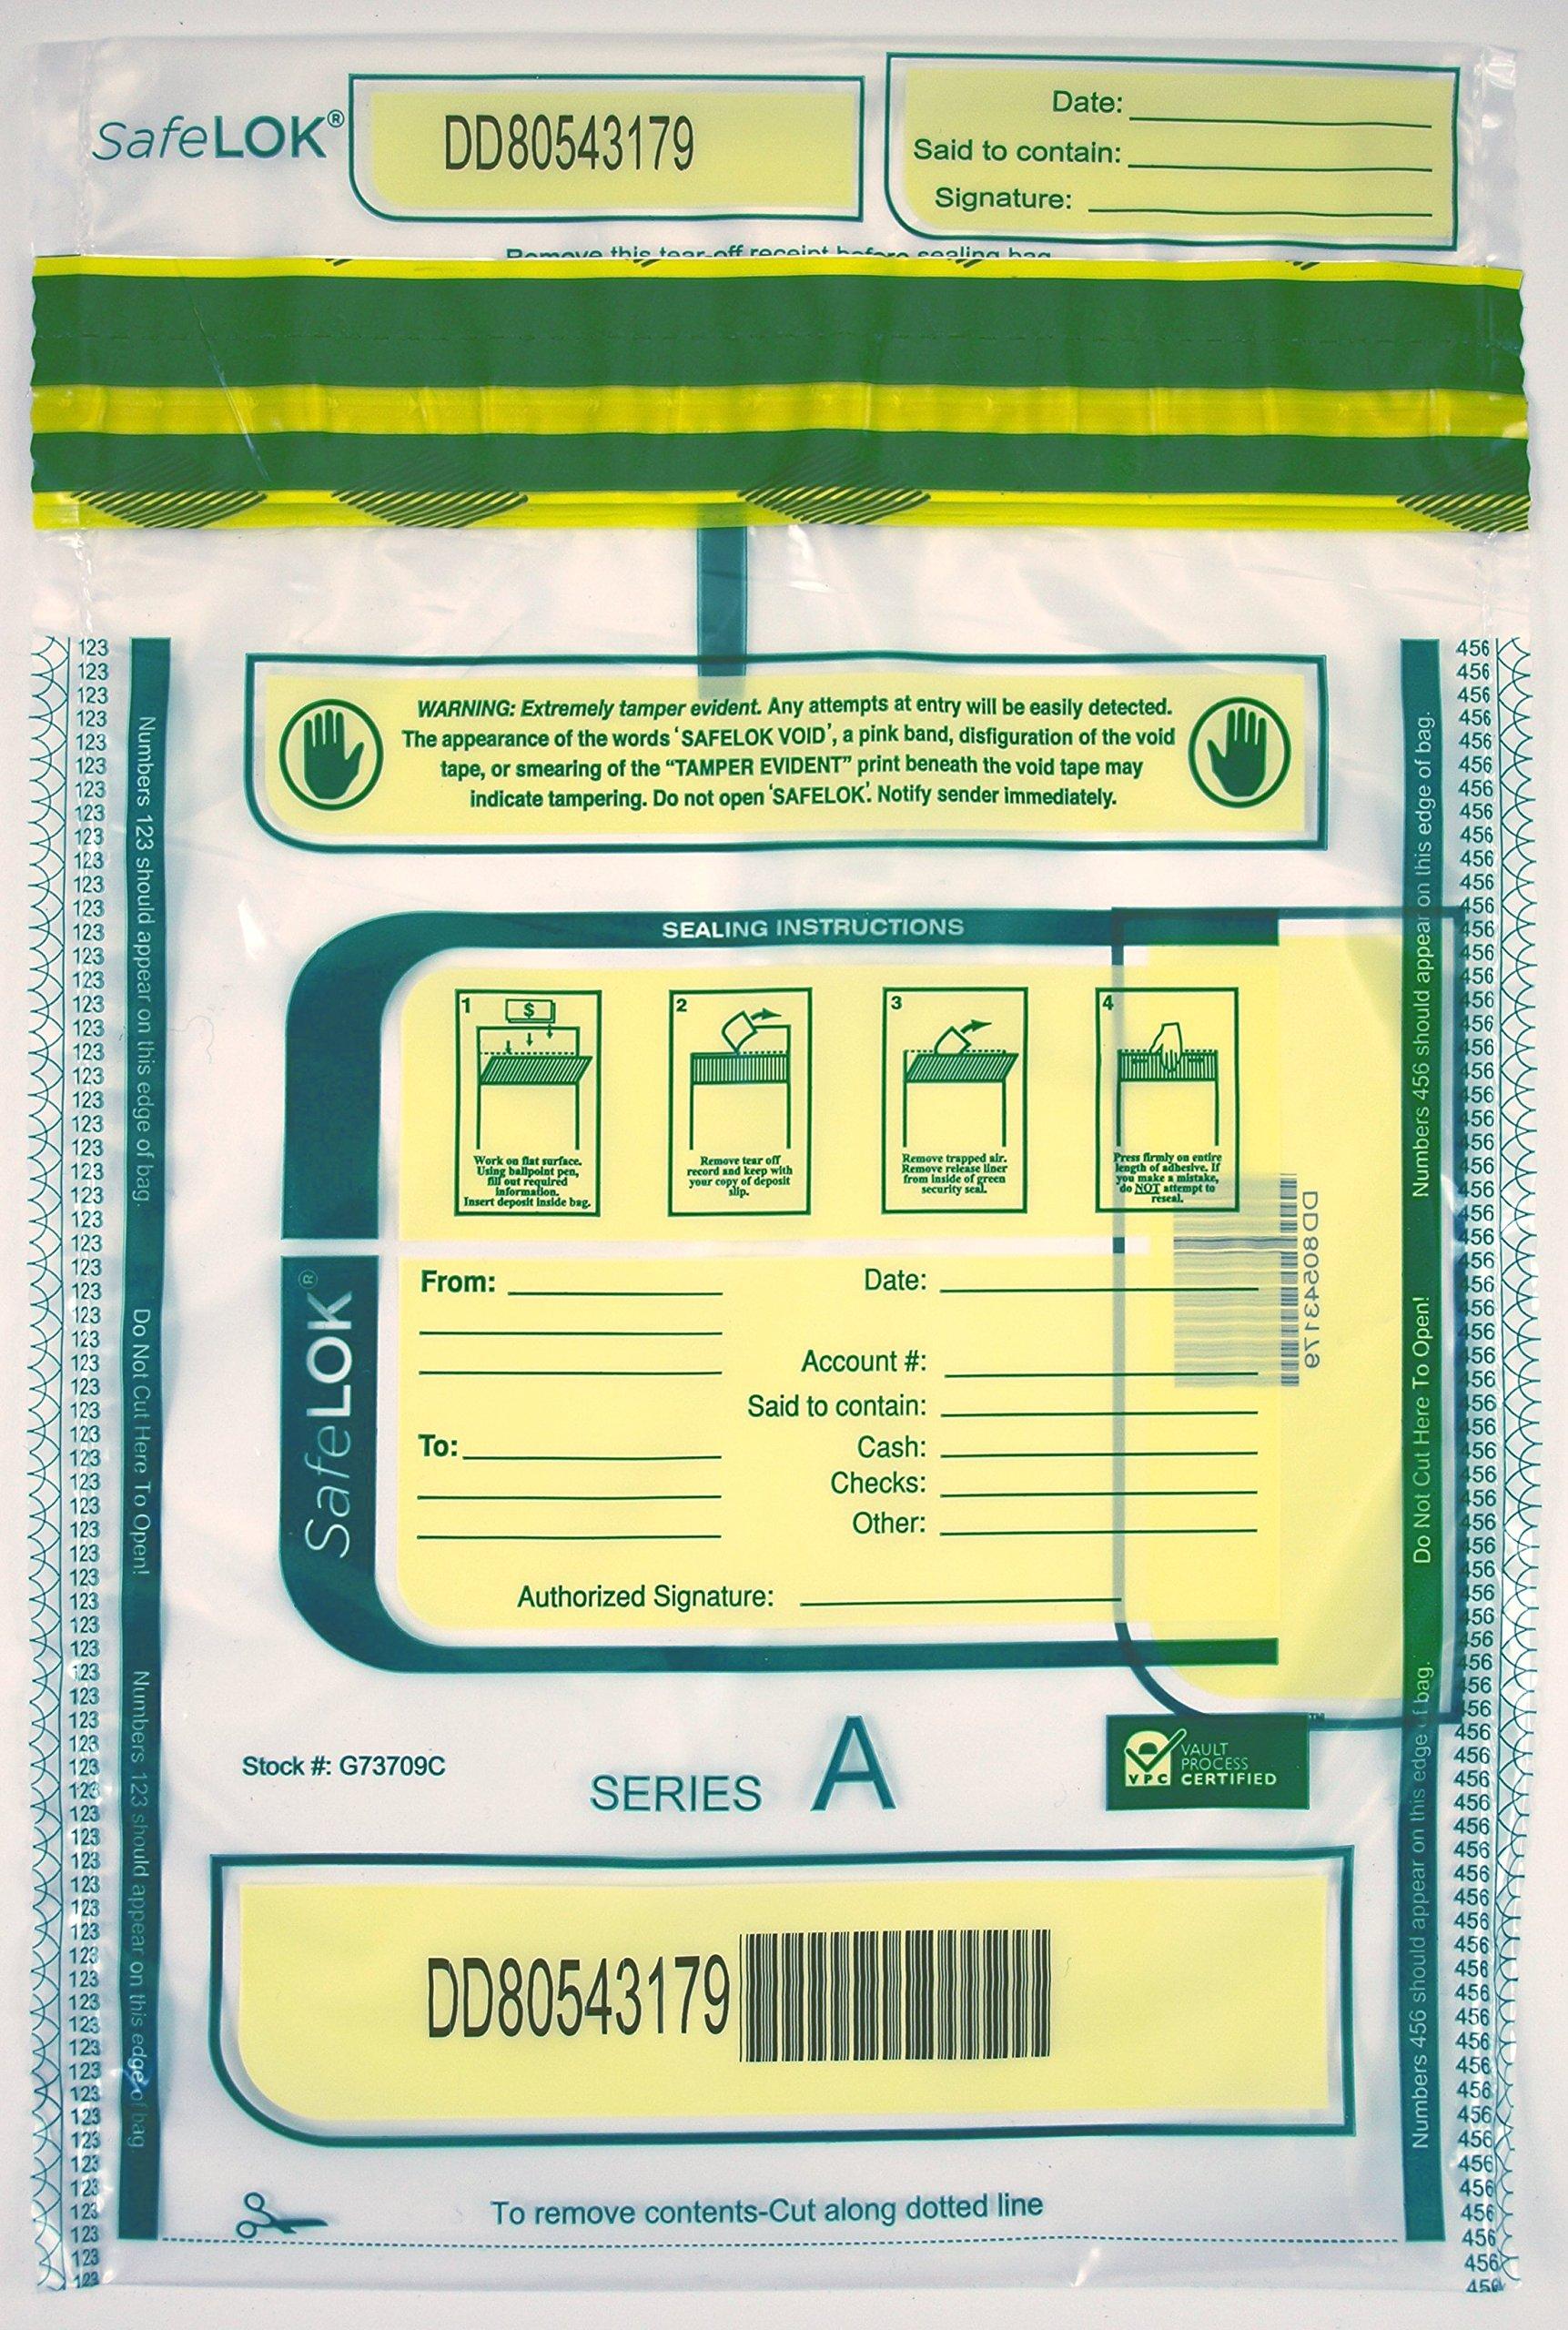 9 x 12 SafeLok, clear, 100 Deposit Bags